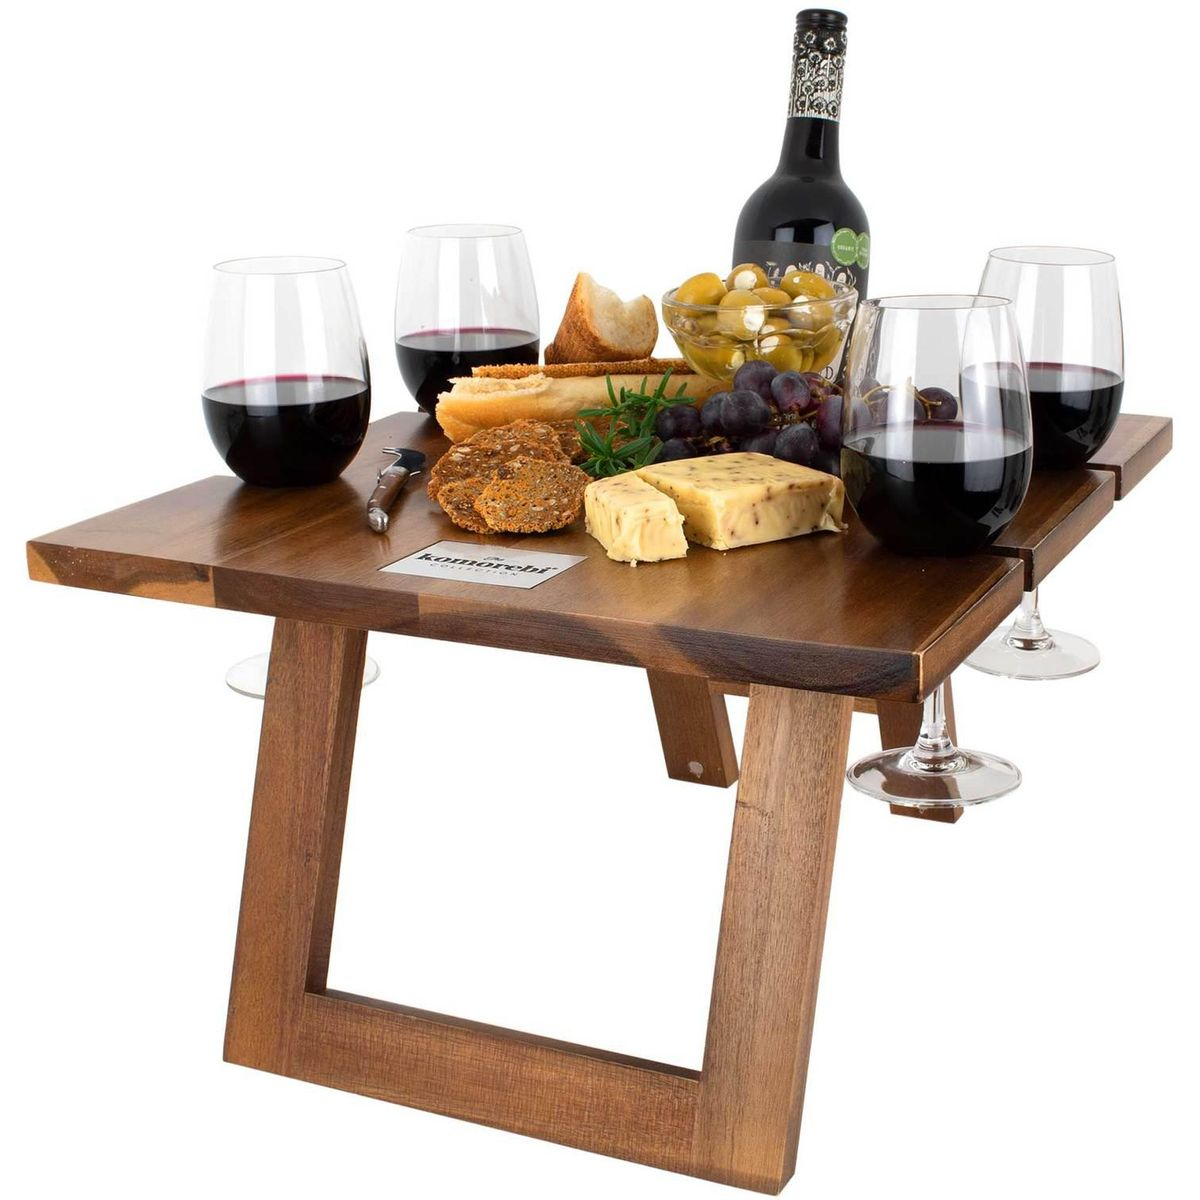 komorebi portable folding picnic table